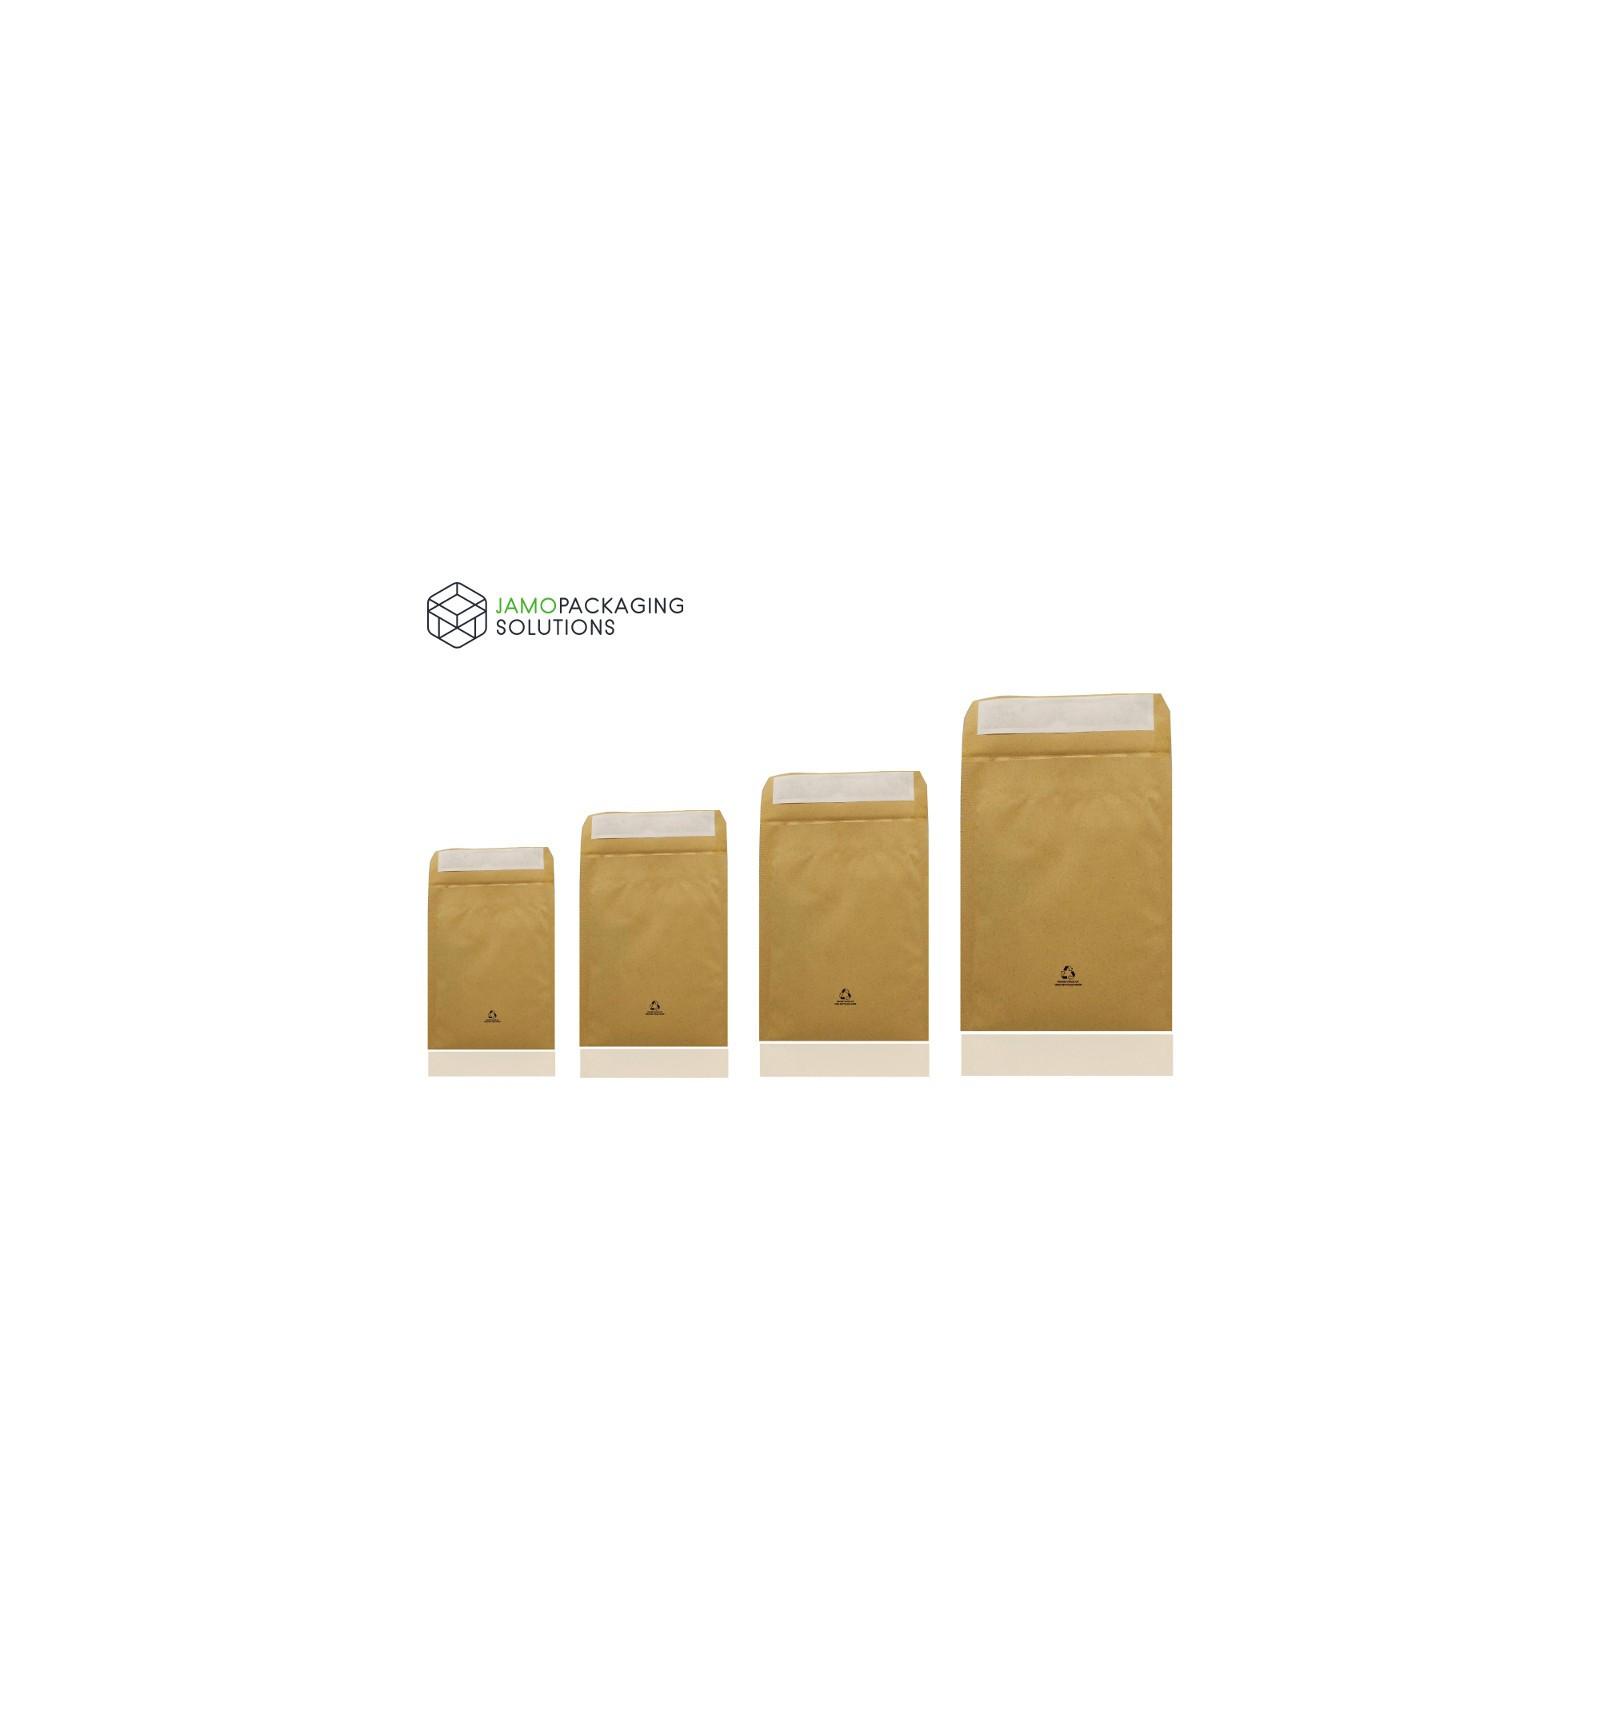 Greenvelopes Eco-friendly Biodegradable Envelope